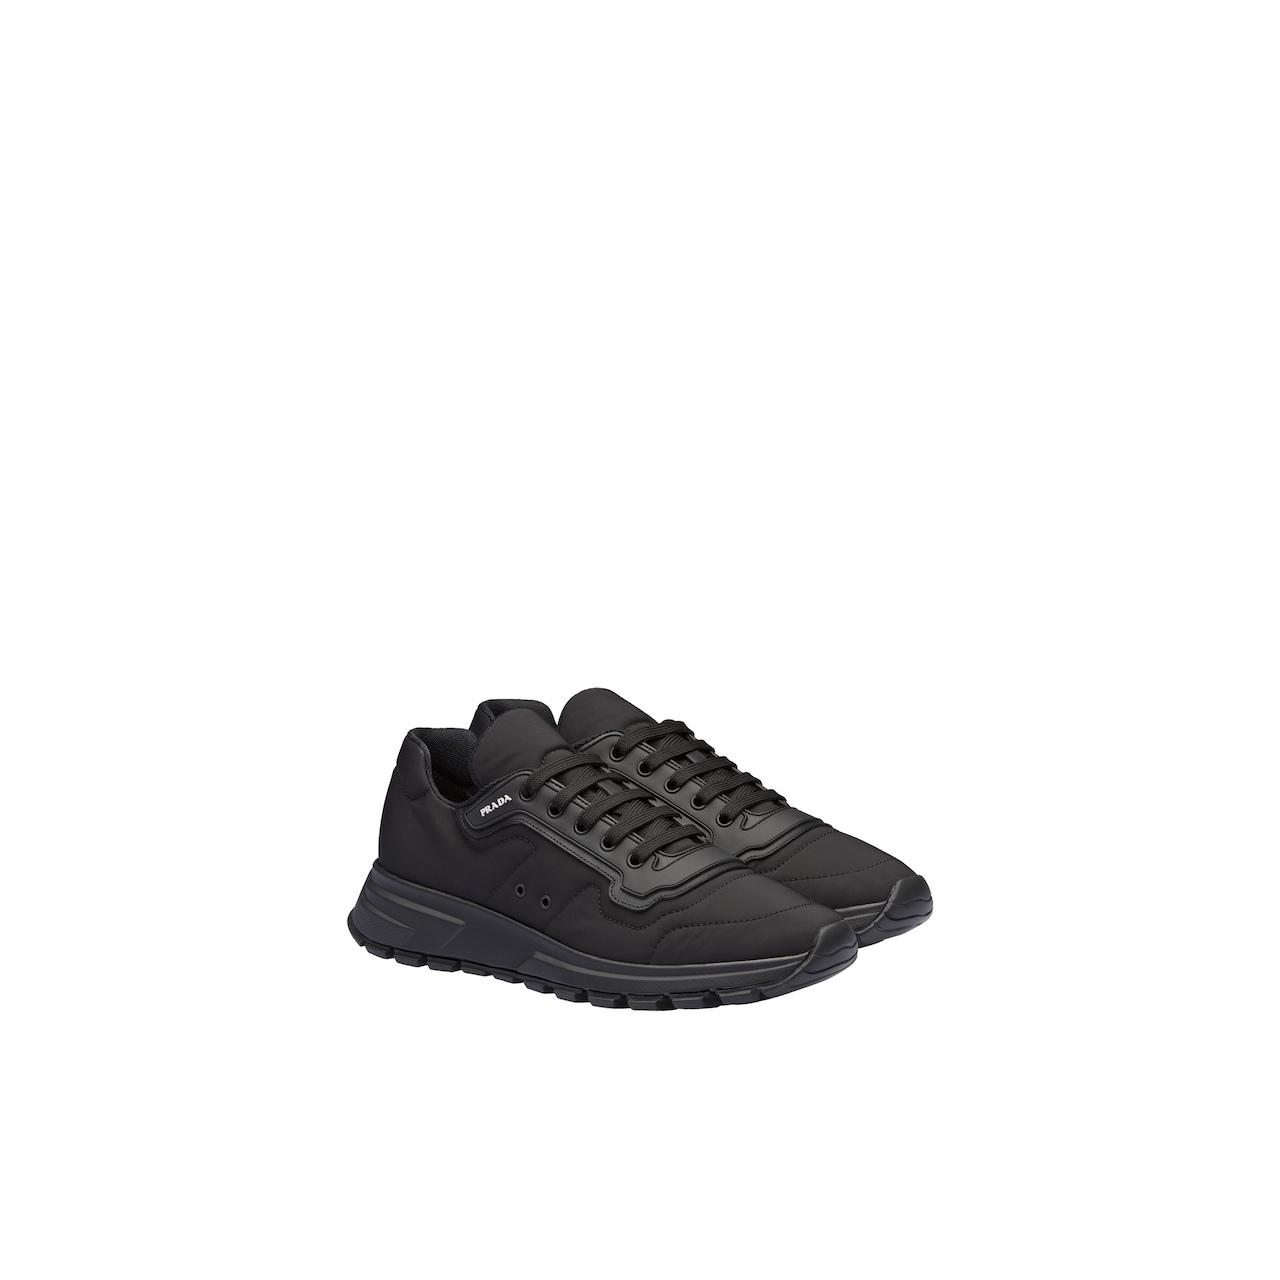 Prada PRAX 01 华达呢运动鞋 1